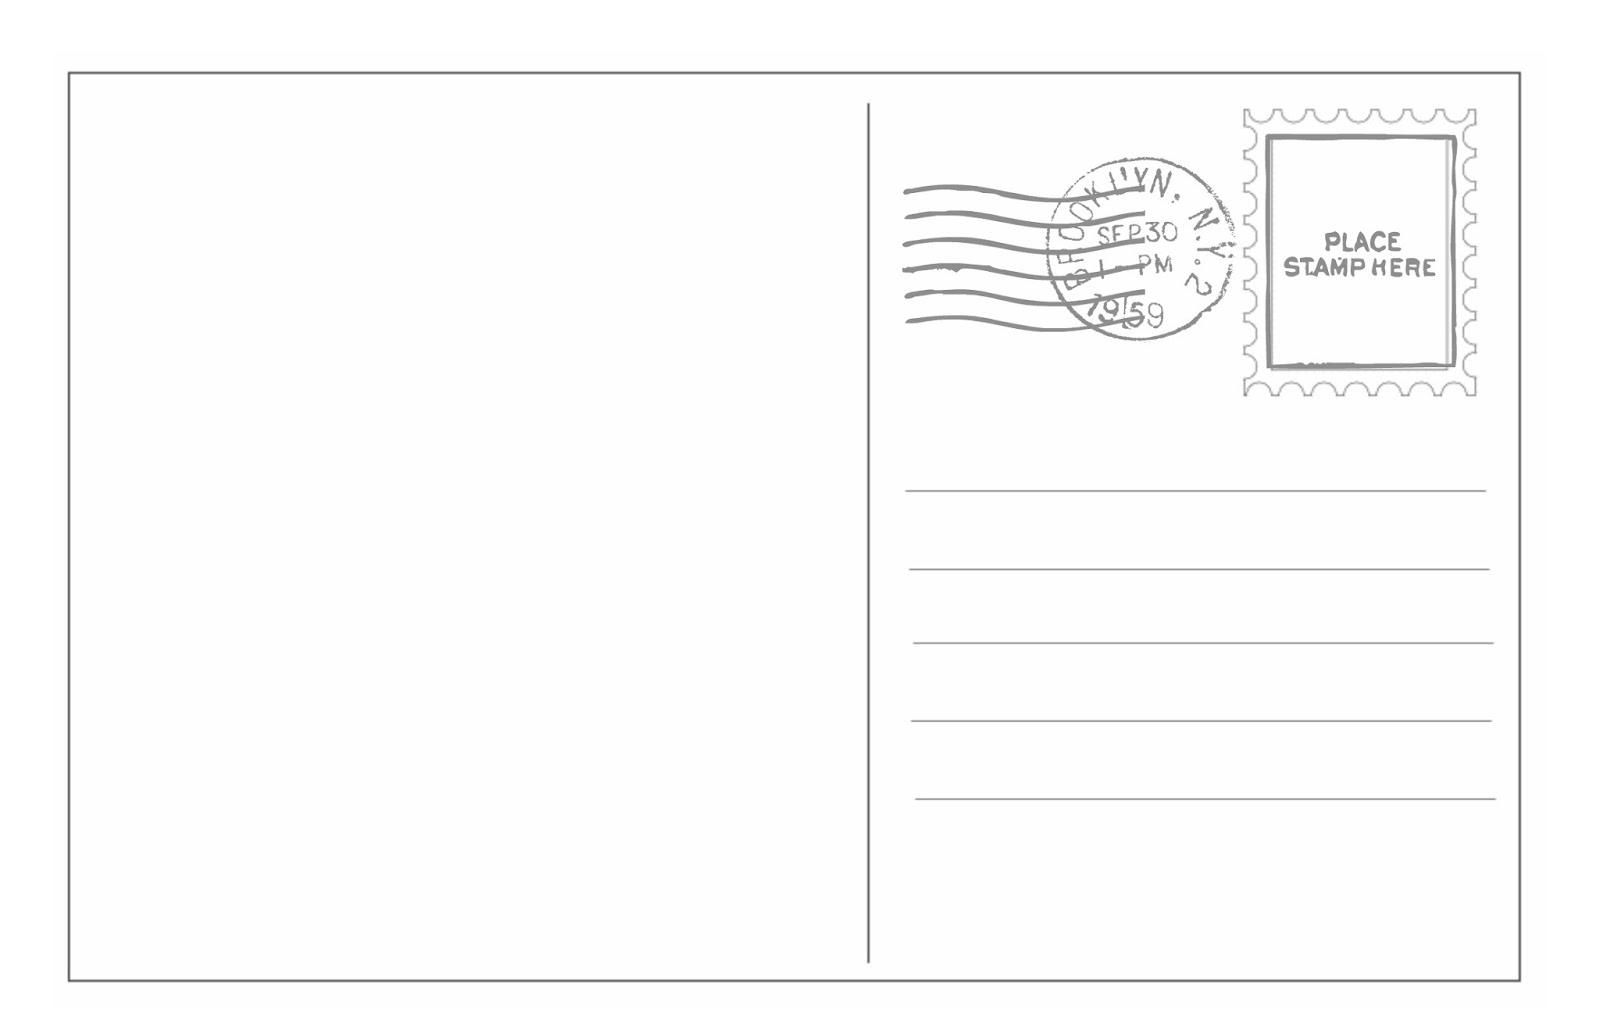 How to write a postcard address template